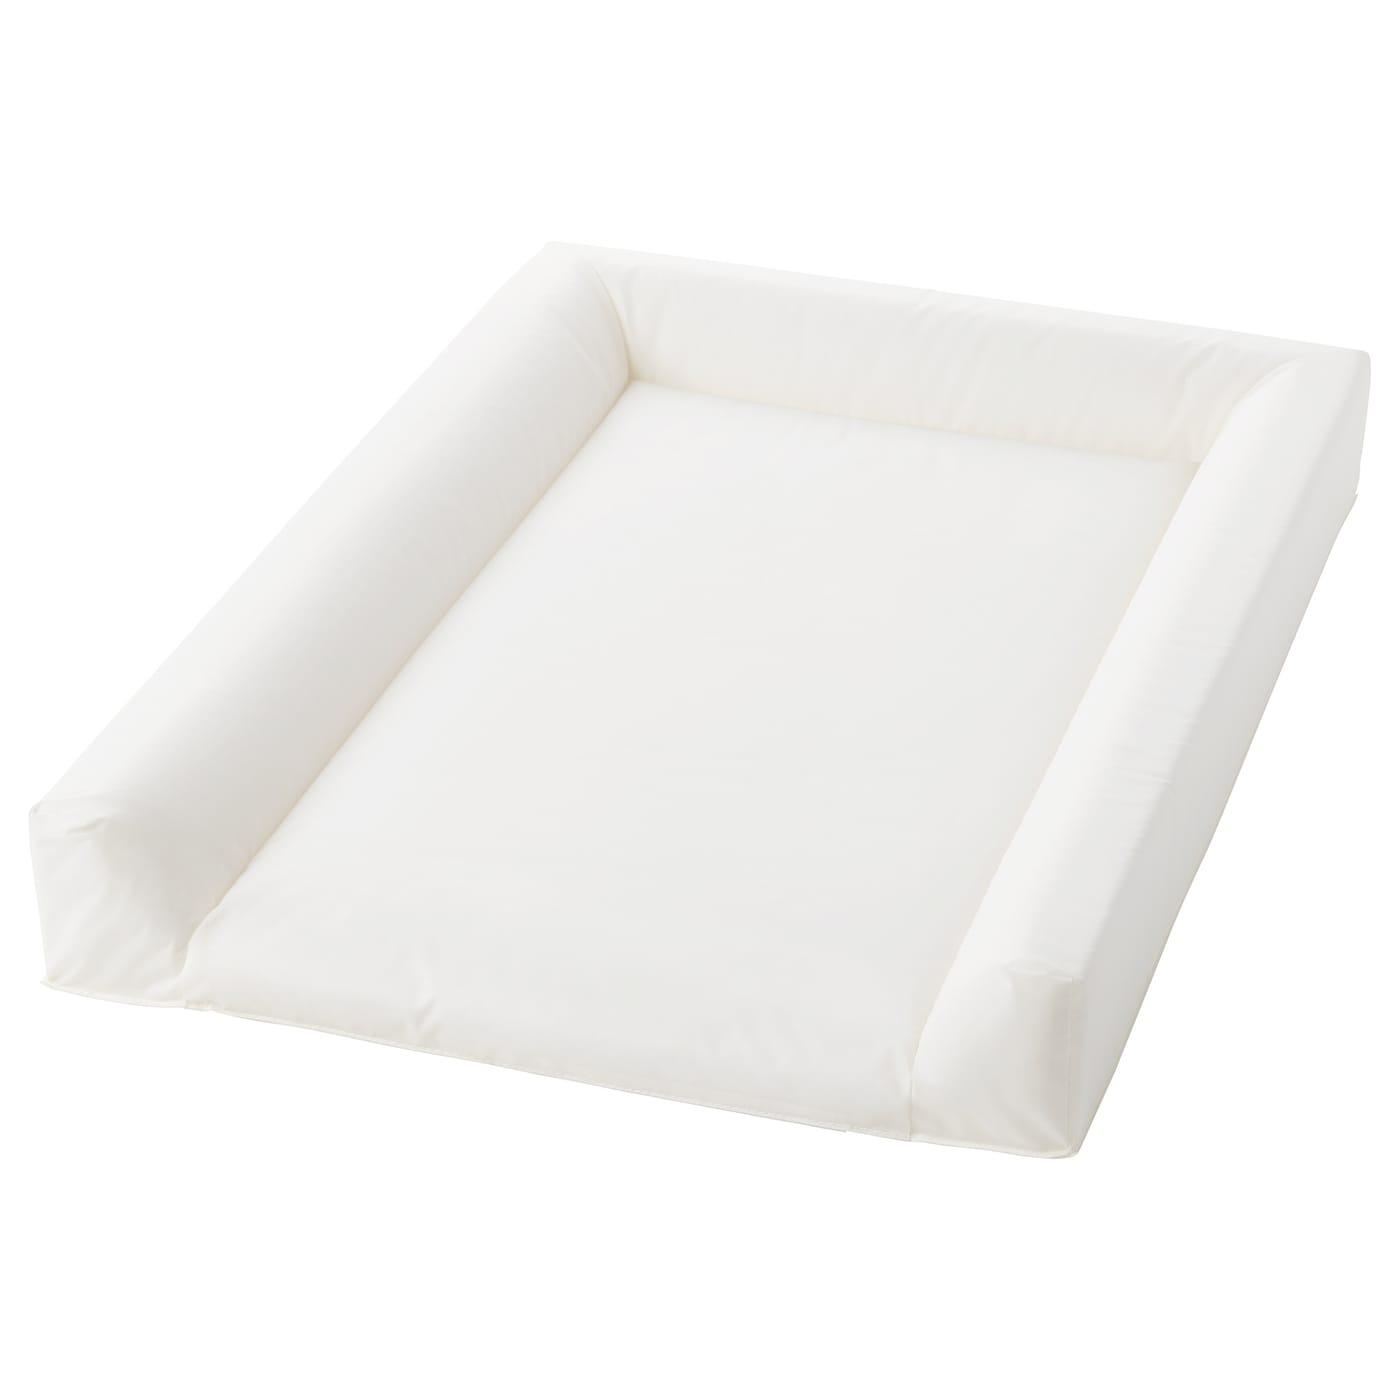 Image of: Vadra Changing Pad 18 7 8×29 1 8 Ikea